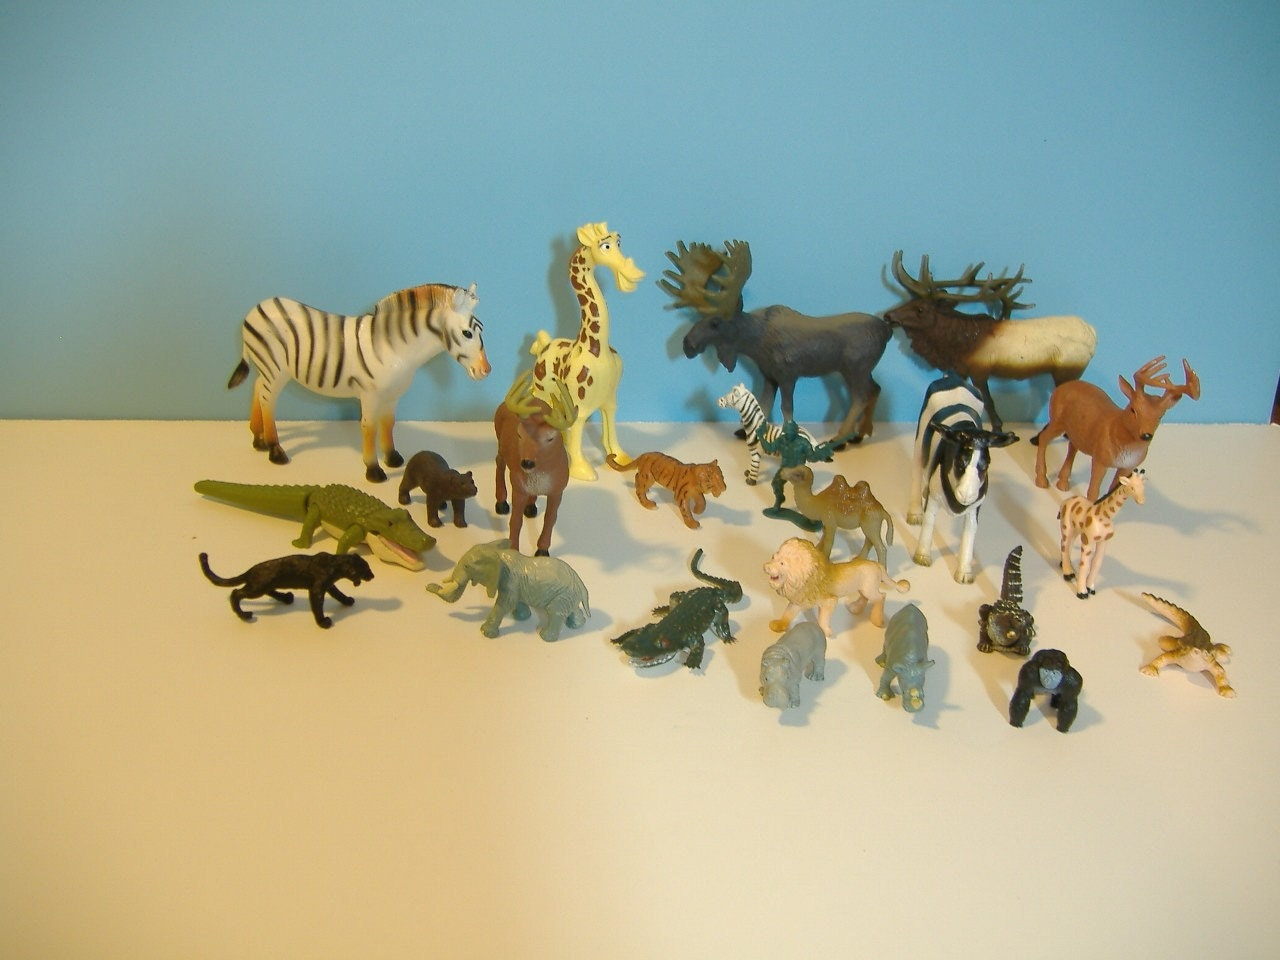 Zoo animals toys - photo#35